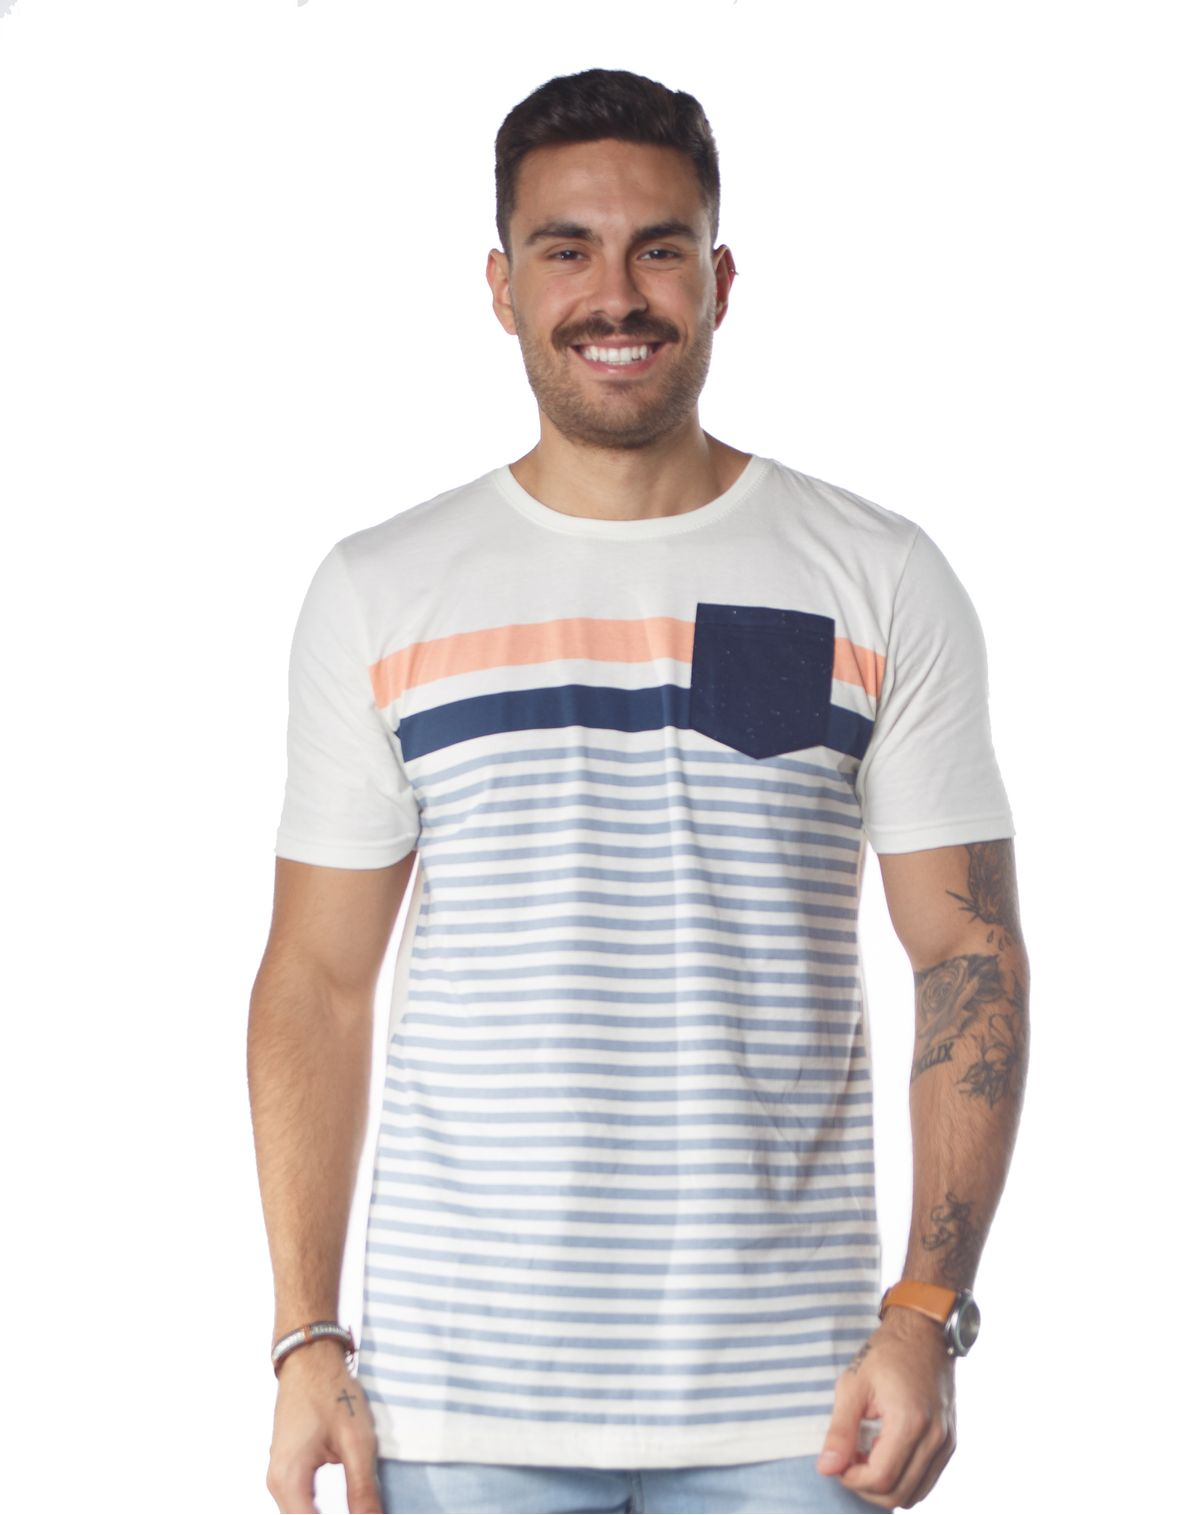 575749001-camiseta-masculina-listrada-bolso-off-white-p-4ef